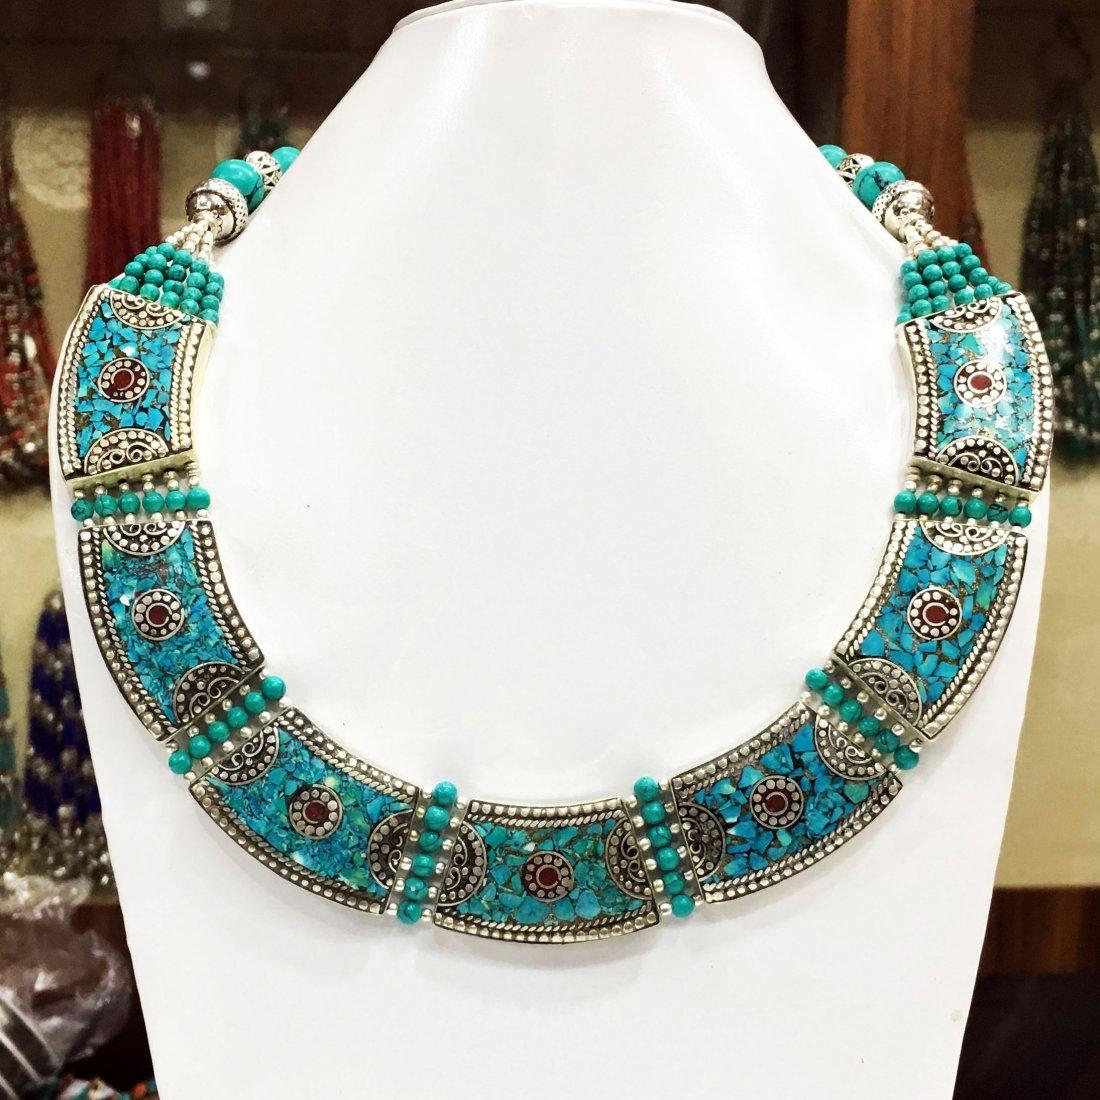 Handmade Turquoise Tibetan Choker Necklace